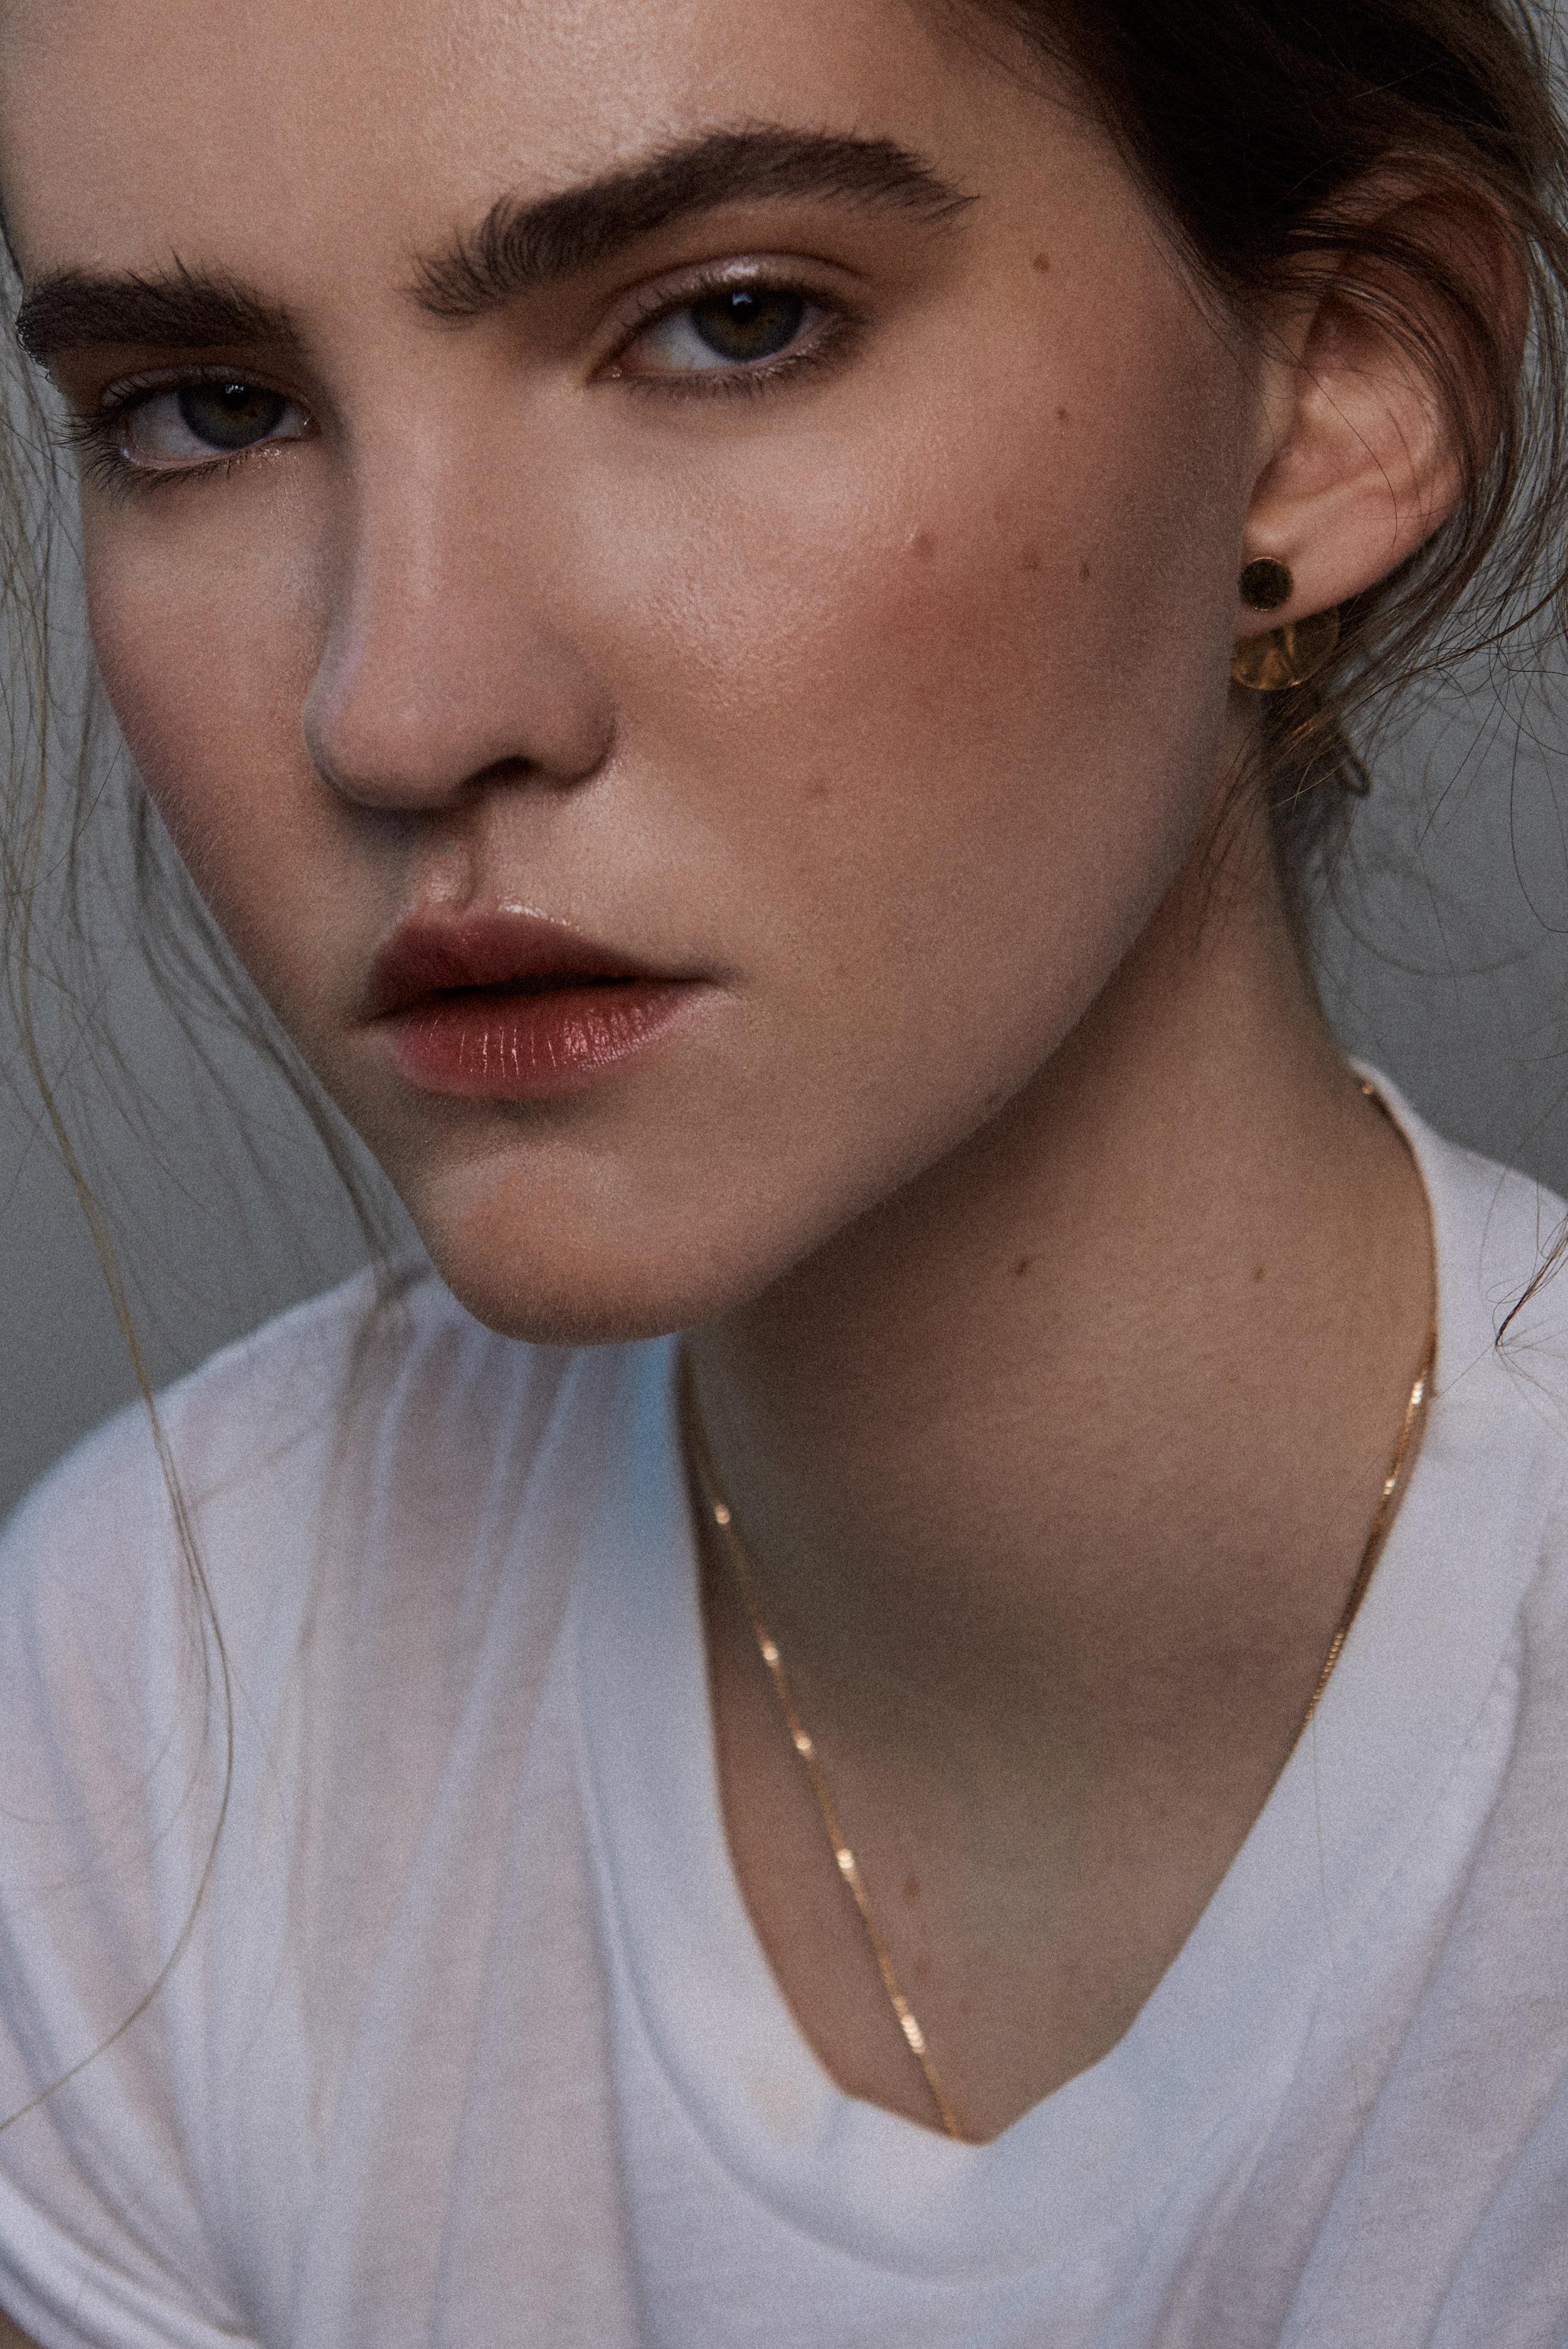 Agnes_Ciaciek_EssenceOfAWoman-4.jpg